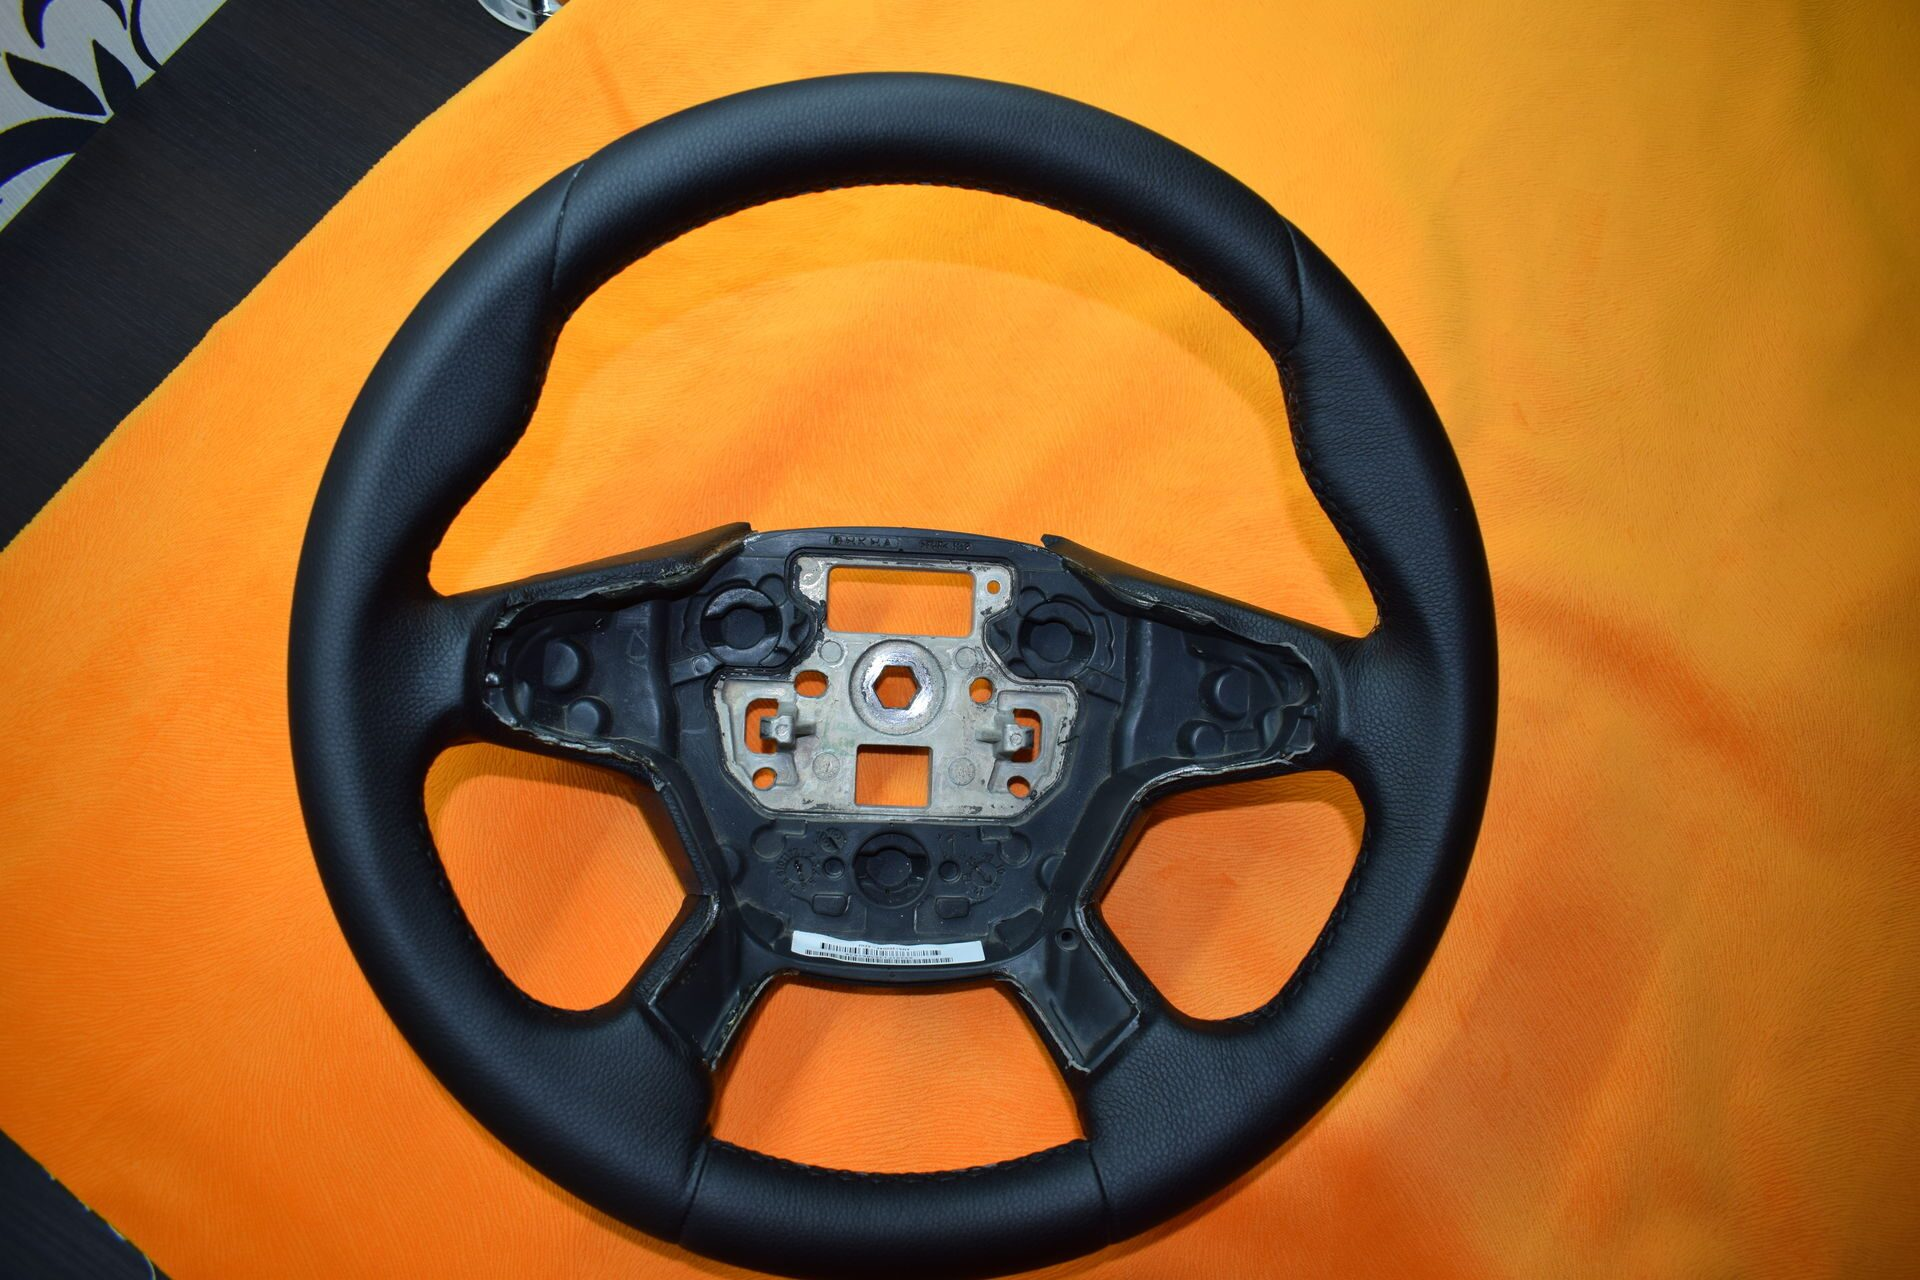 Ford Kuga (Форд Куга) - Продажа, Цены, Отзывы, Фото...